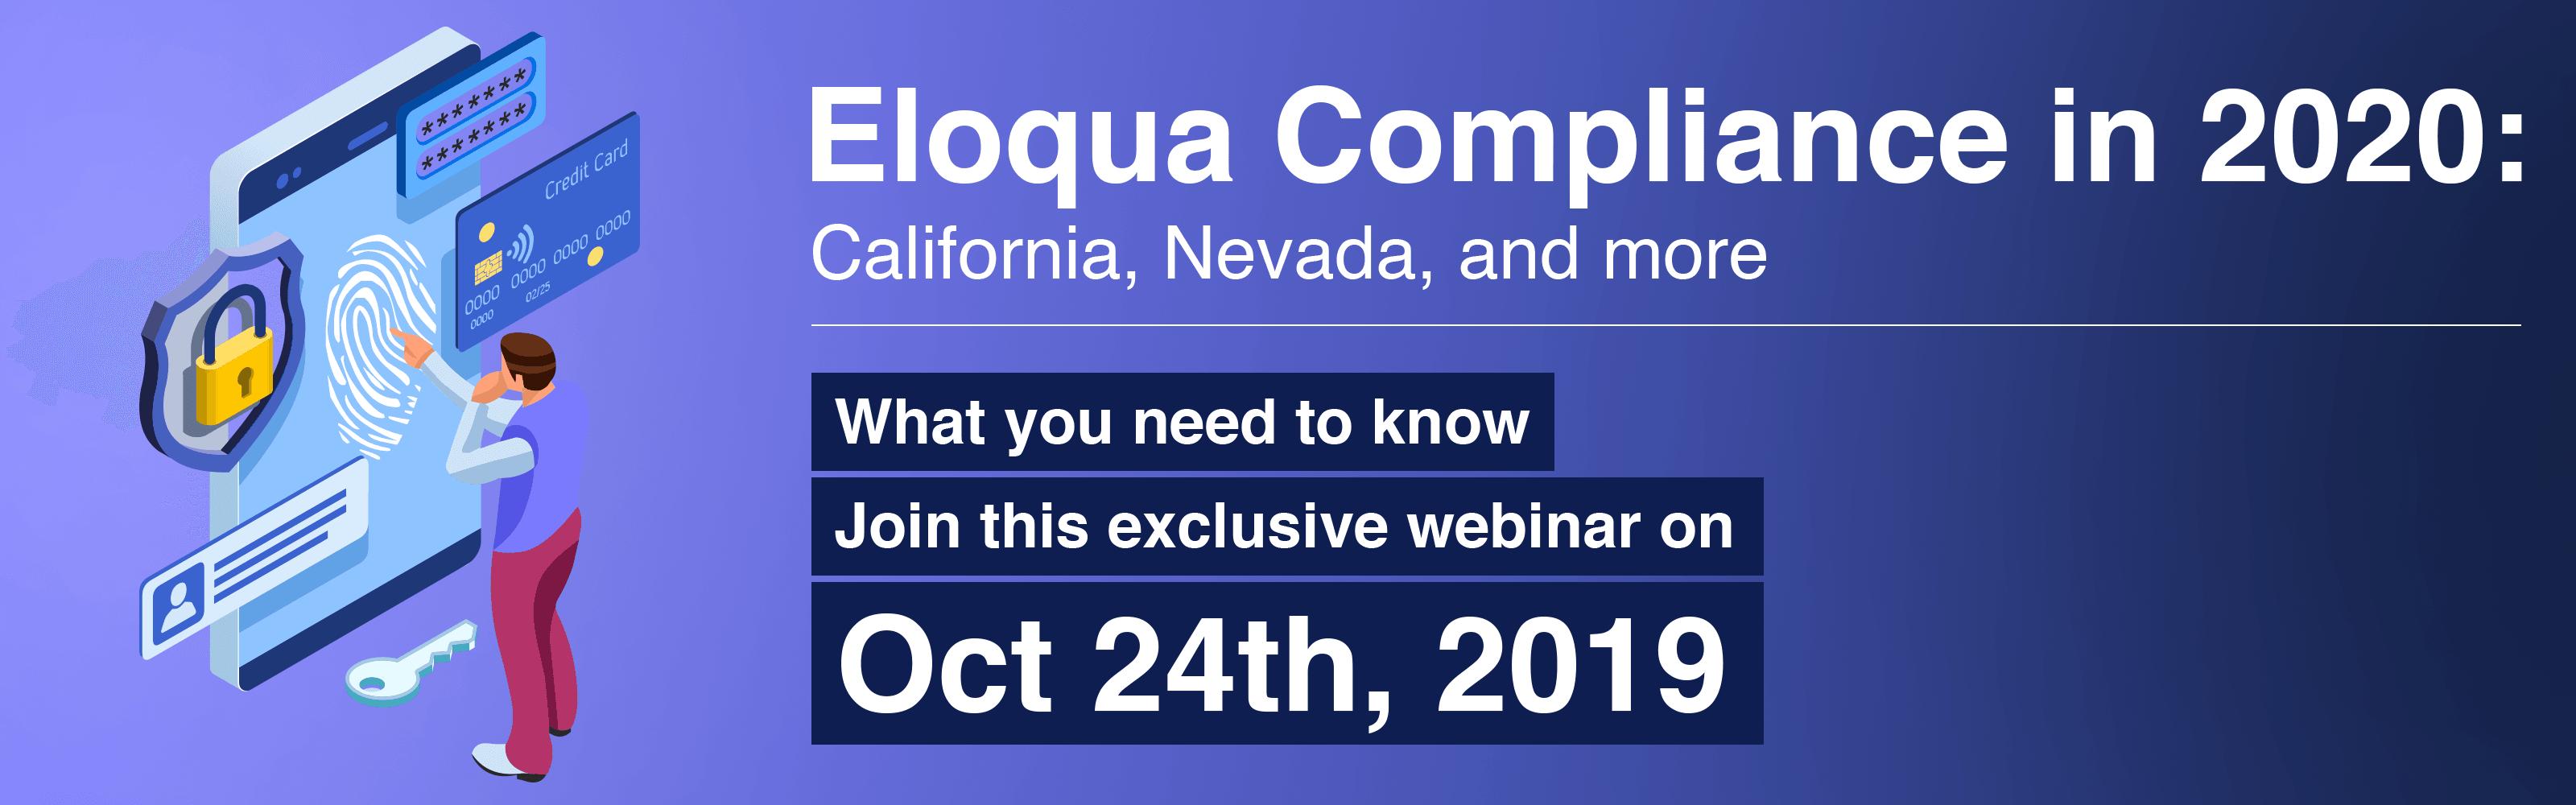 Eloqua Compliance in 2000 Webinar Invitation